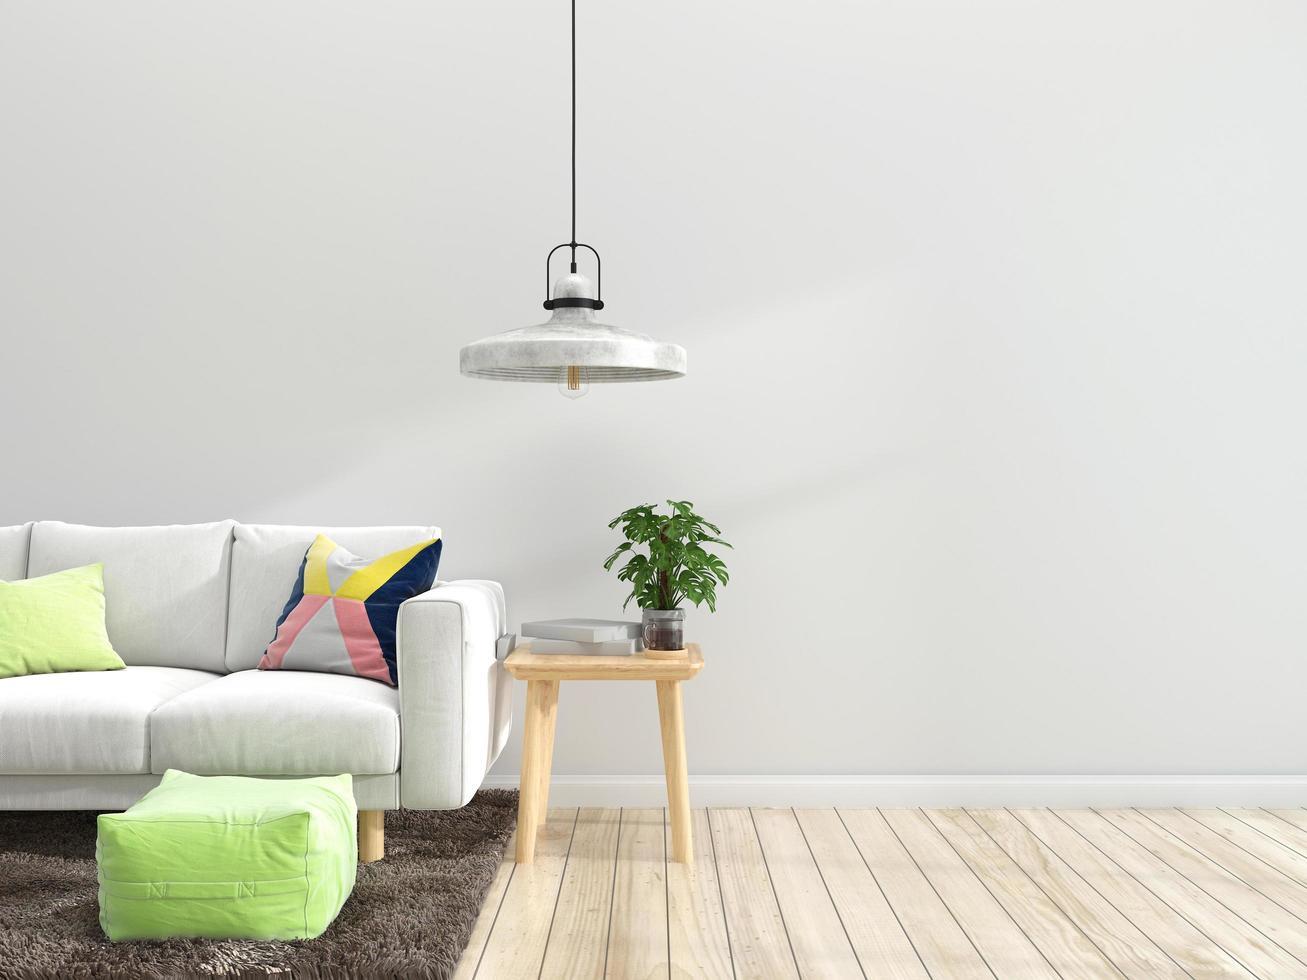 interior minimalista de la sala de estar foto